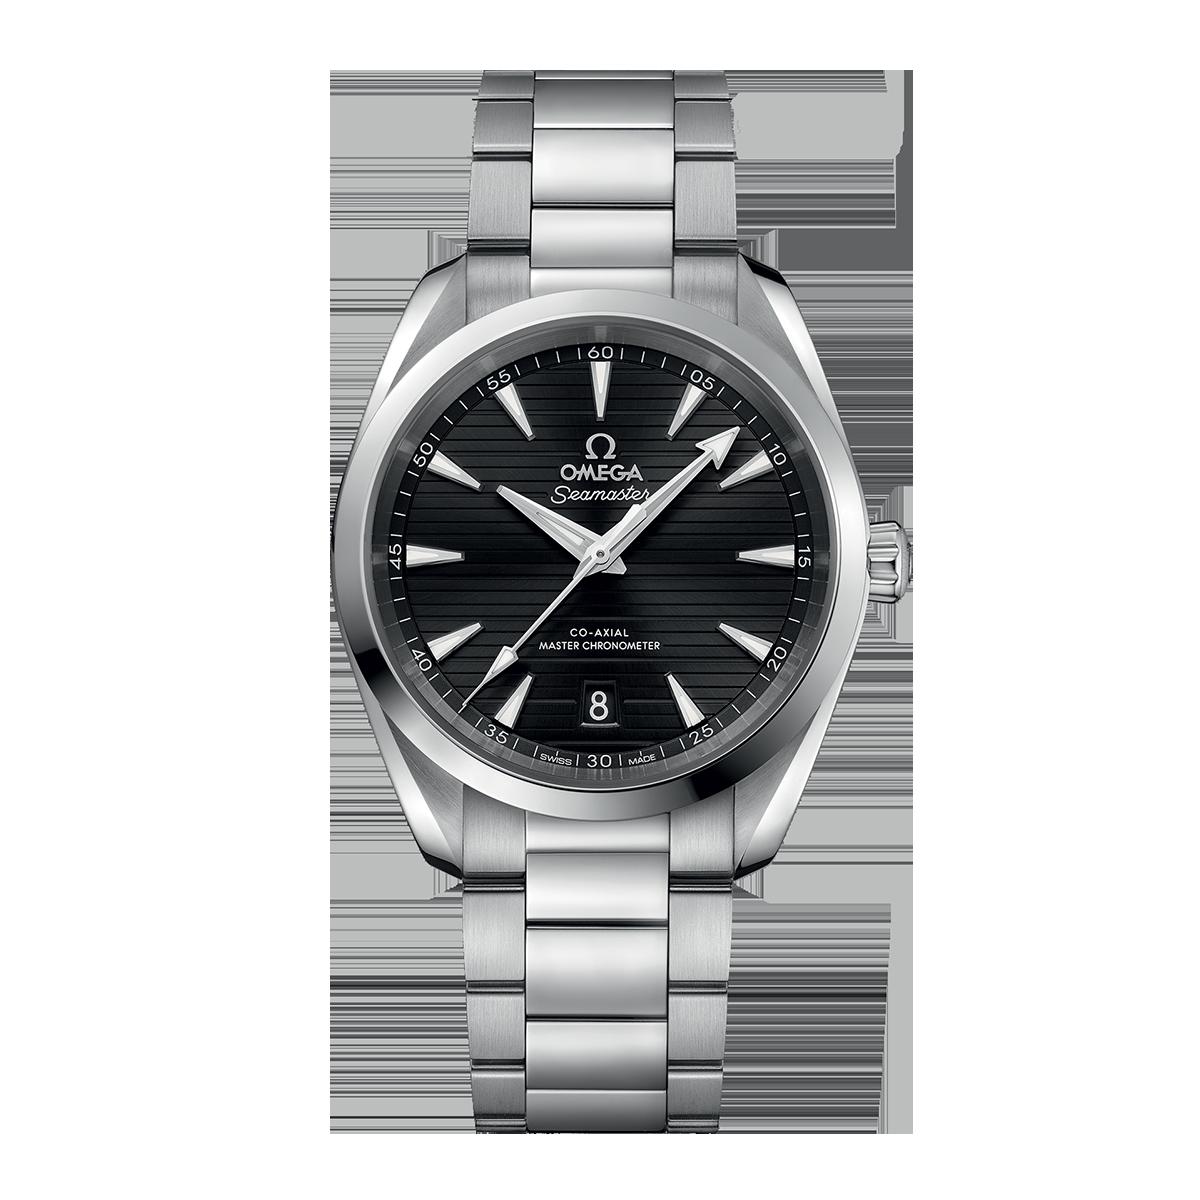 omega-seamaster-aqua-terra-150m-omega-co-axial-38-mm-22010382001001-1_hos Jarl Sandin